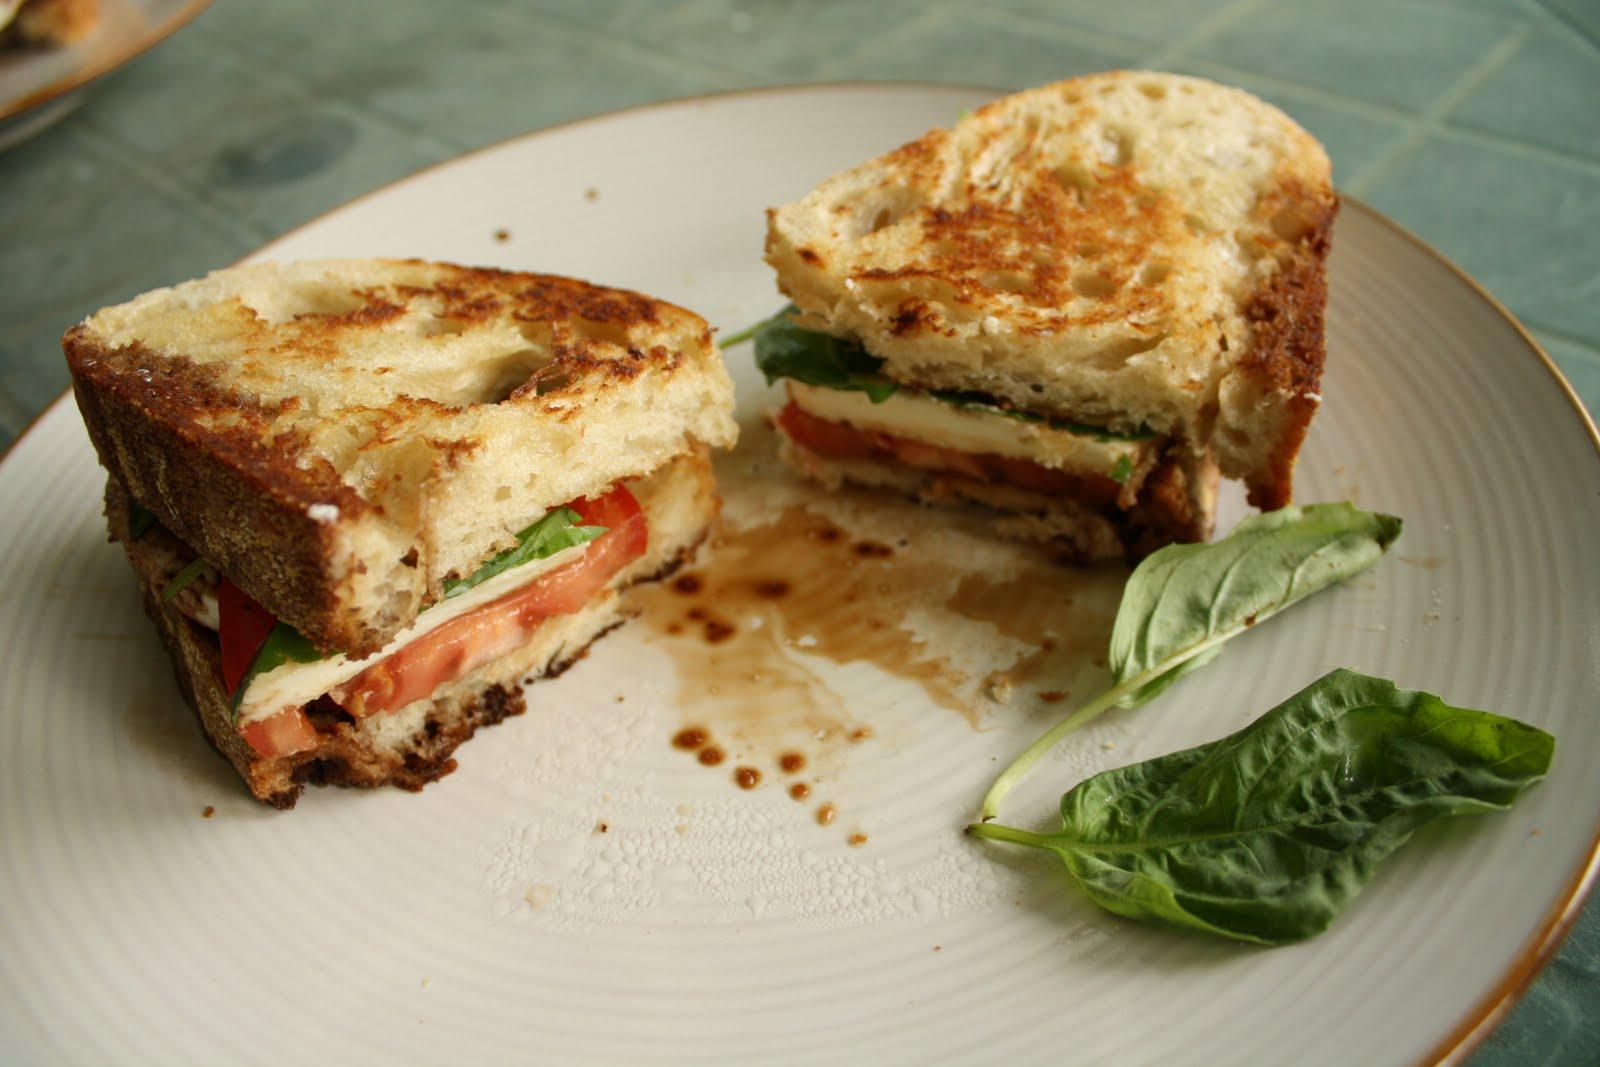 Artistic Eatables: Tomato, Basil, and Mozzarella Sandwiches